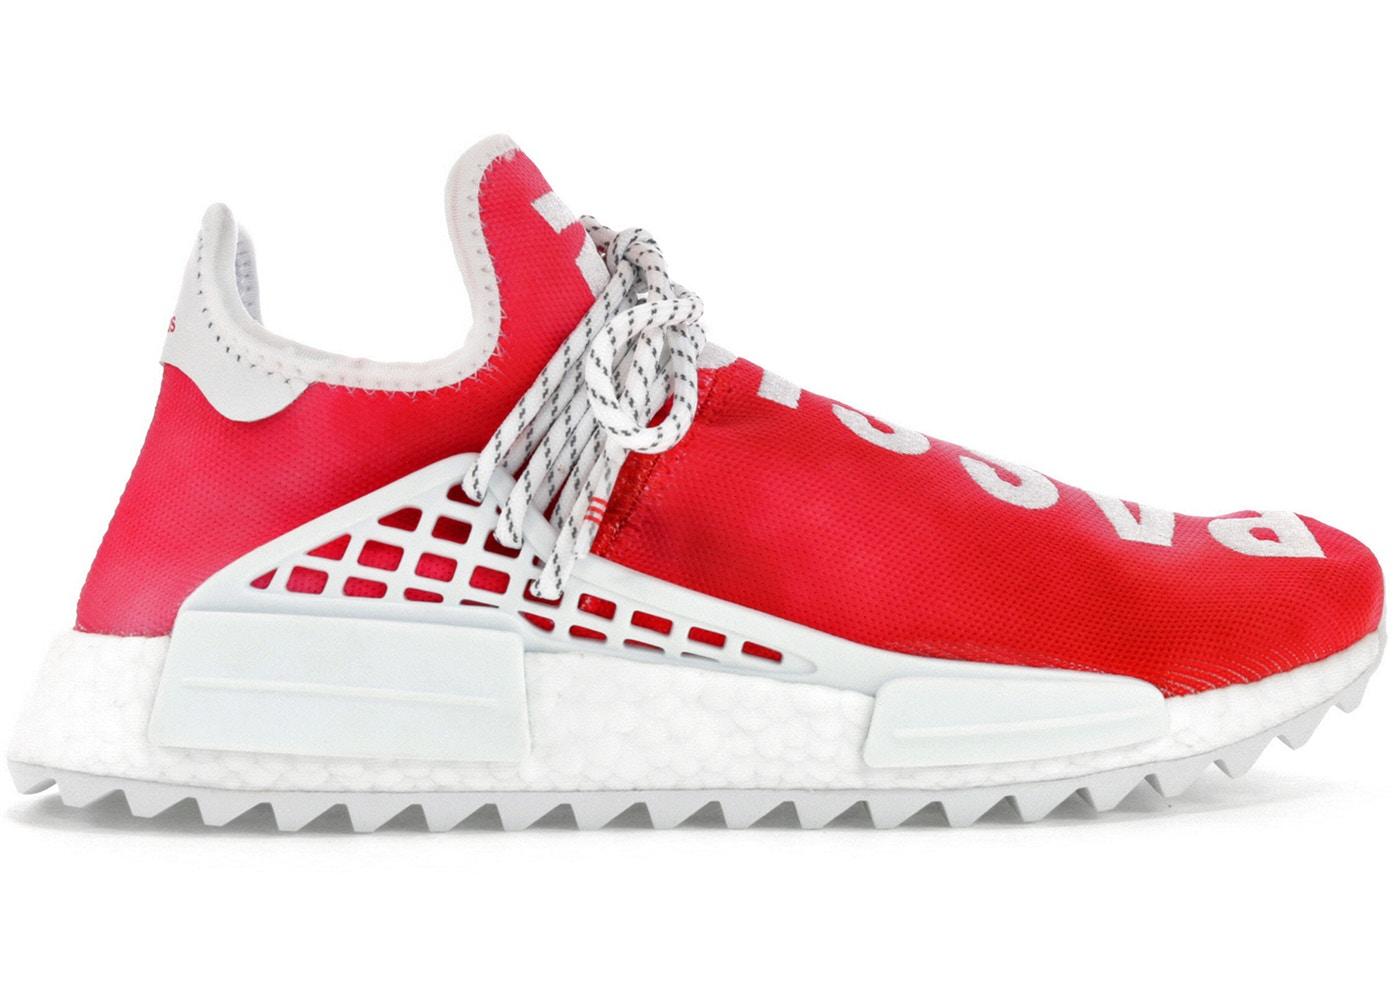 adidas Pharrell NMD HU China Pack Passion レッド/ホワイト